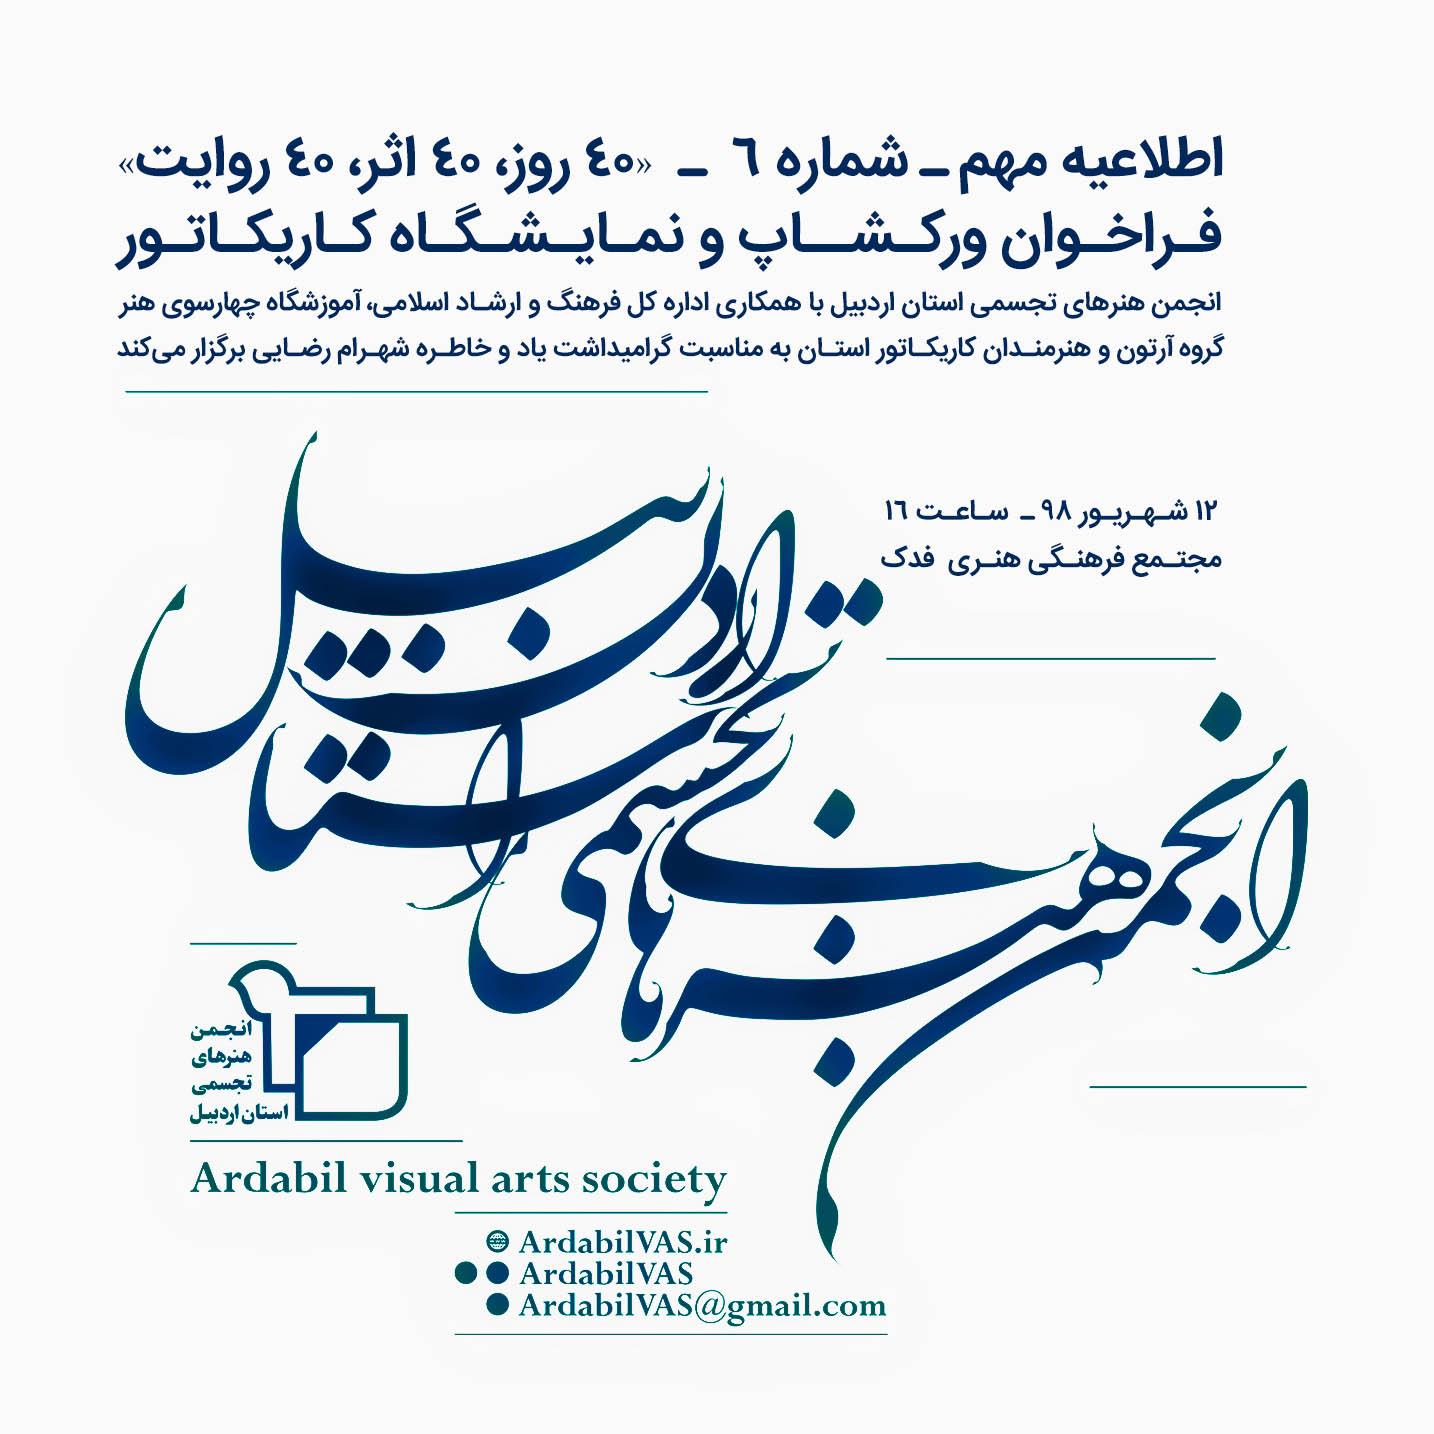 Photo of فراخوان کاریکاتور «۴۰ روز، ۴۰ اثر، ۴۰ روایت» ـ گرامیداشت یاد و خاطره شهرام رضایی